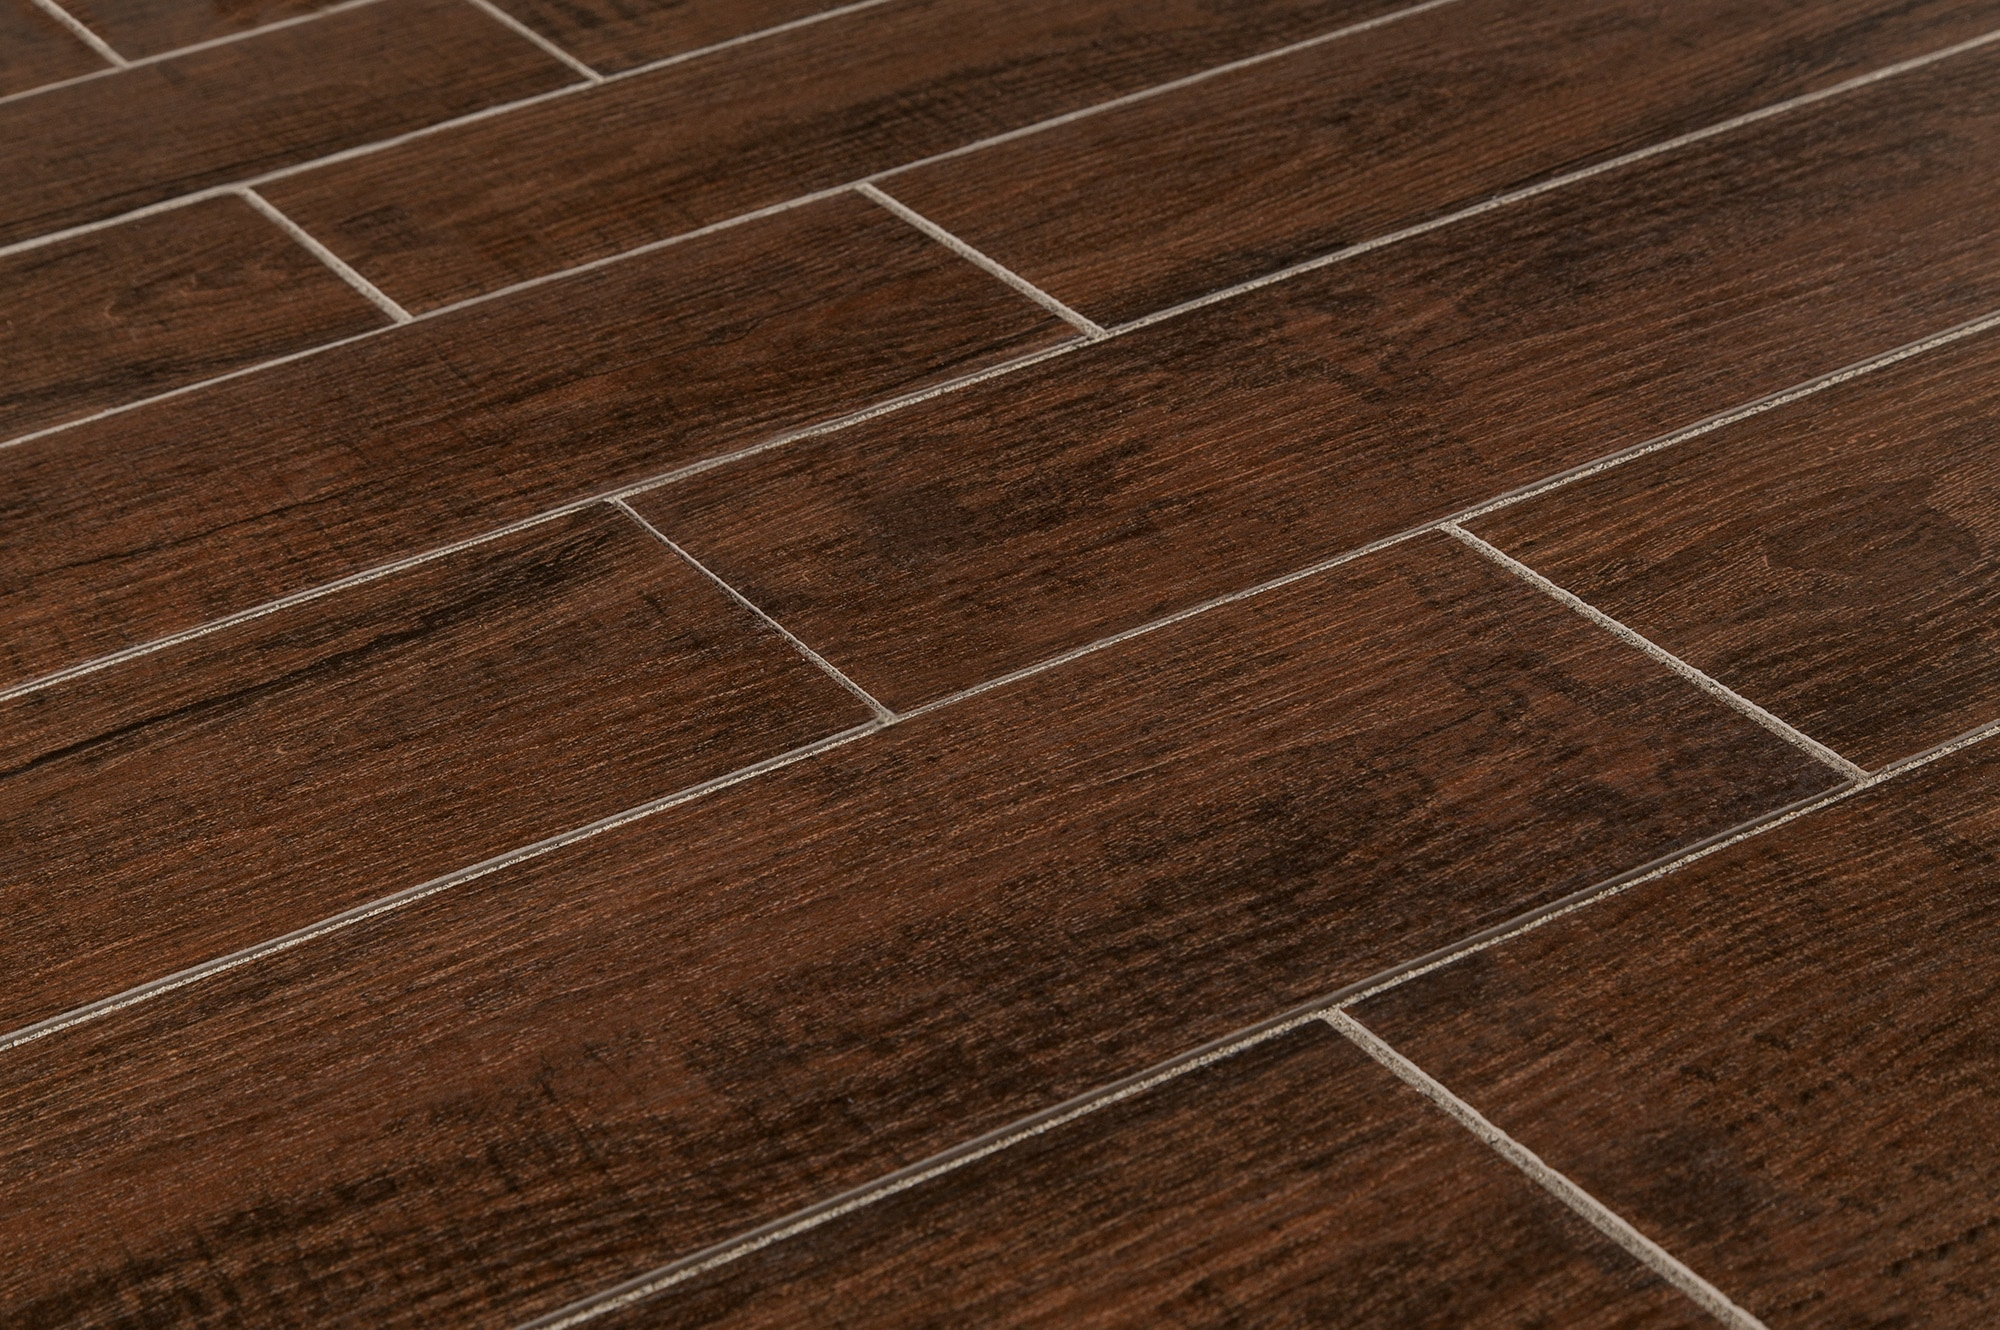 Ceramic Tile Stone : Salerno porcelain tile timber stone collection hd